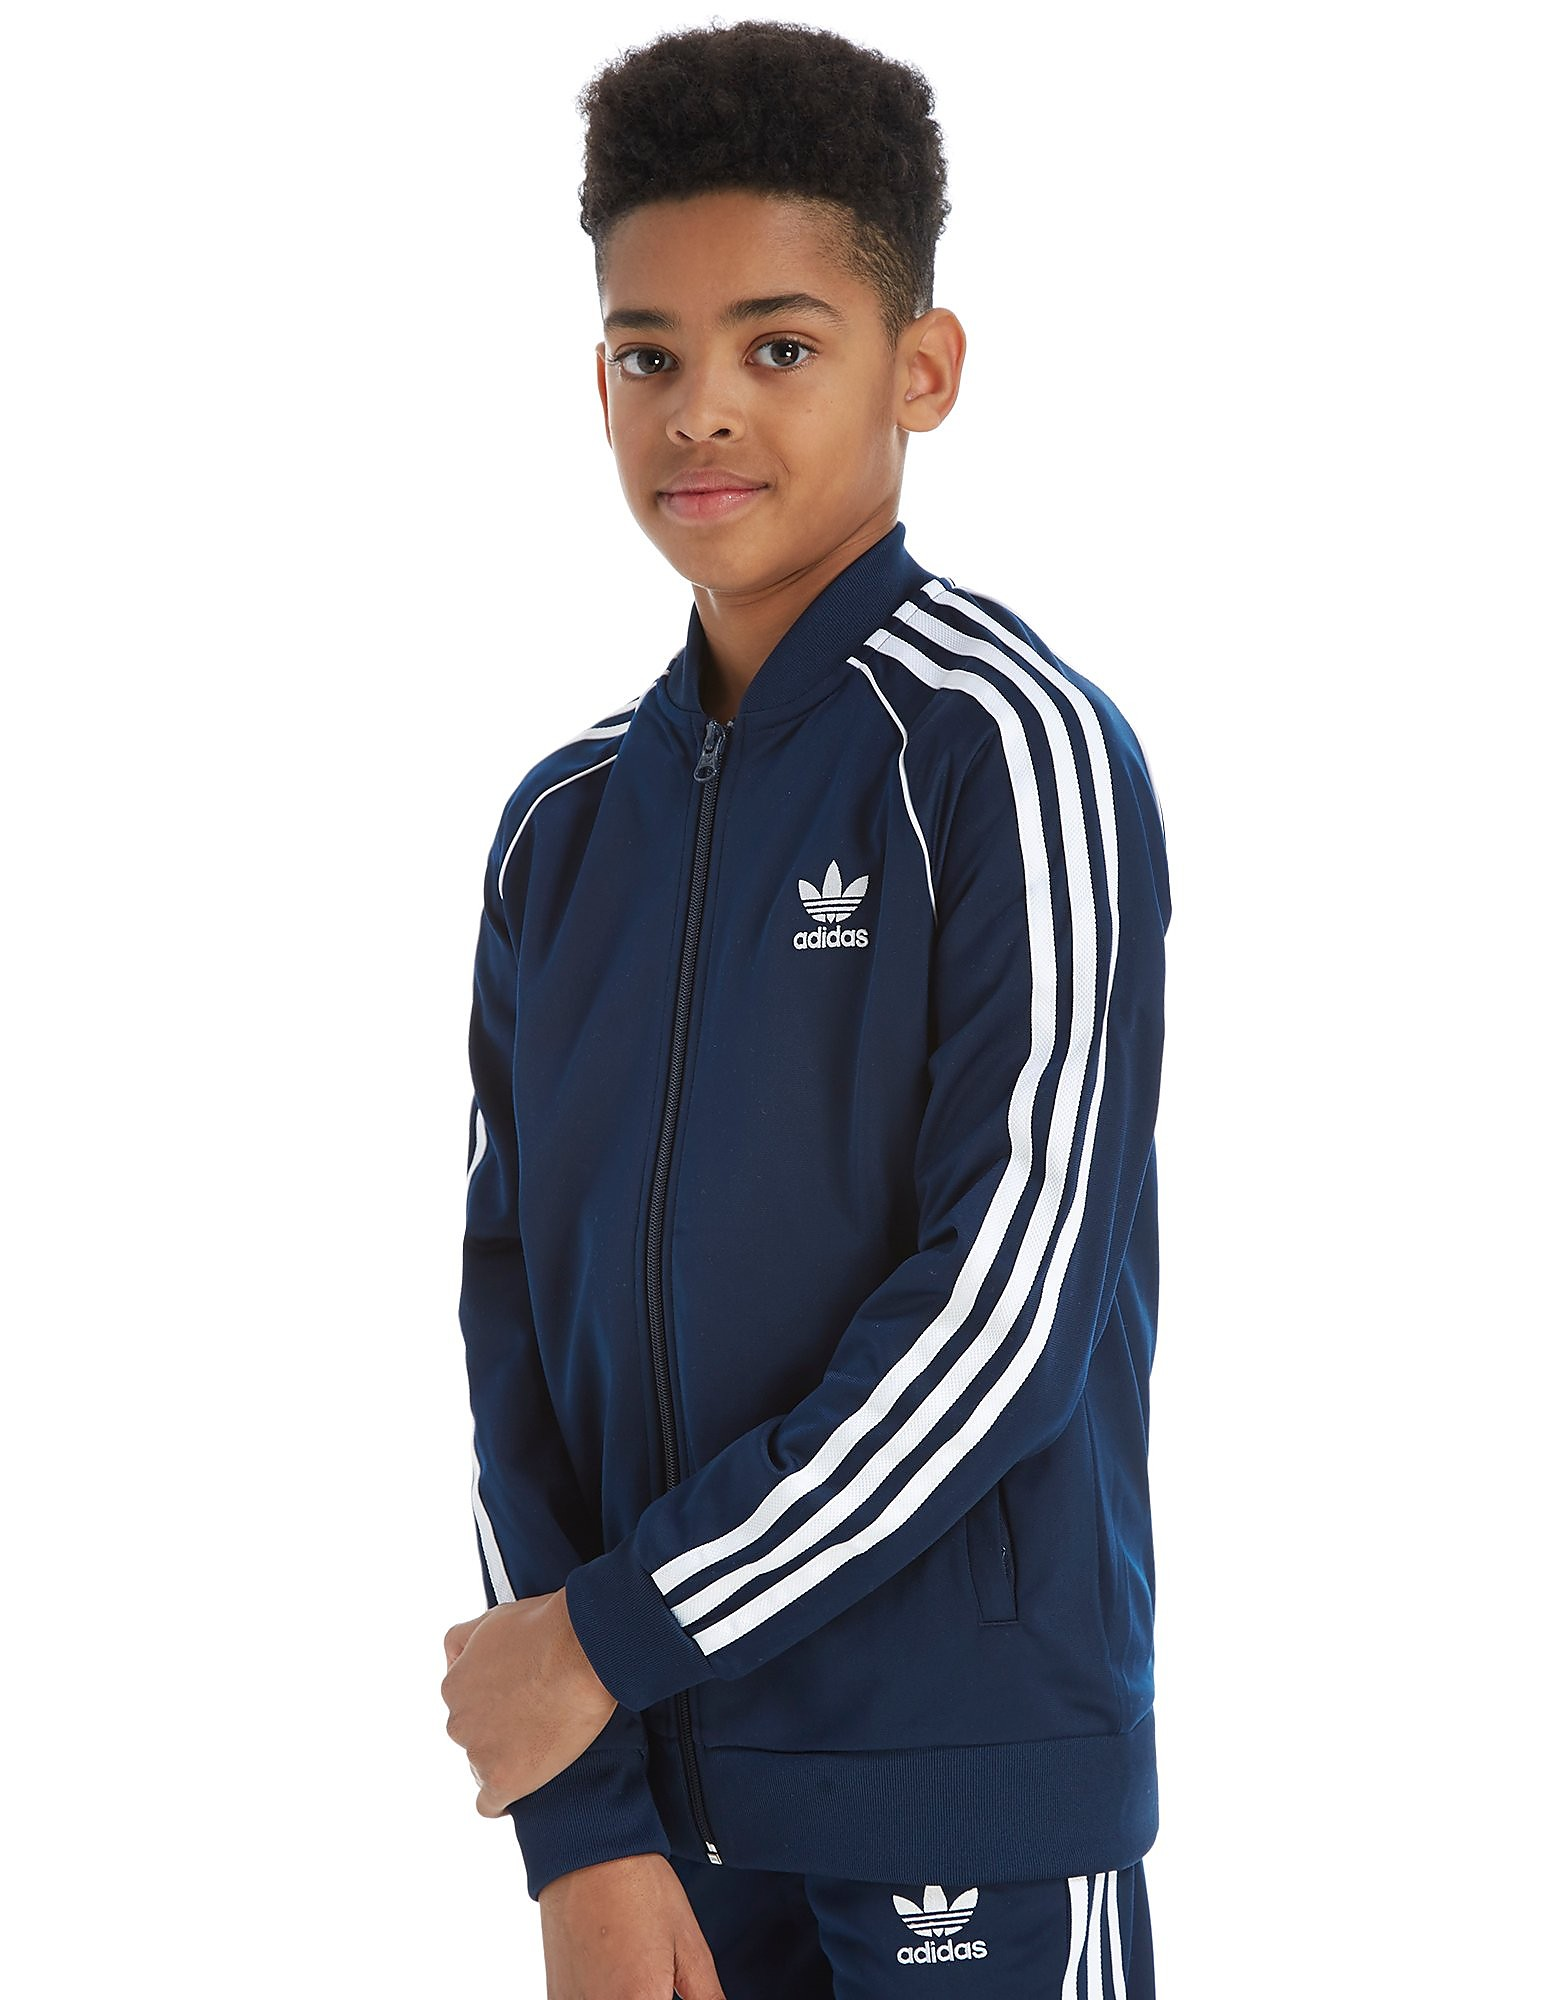 adidas Originals Superstar Trainingsoberteil Junior Marineblau-Weiß